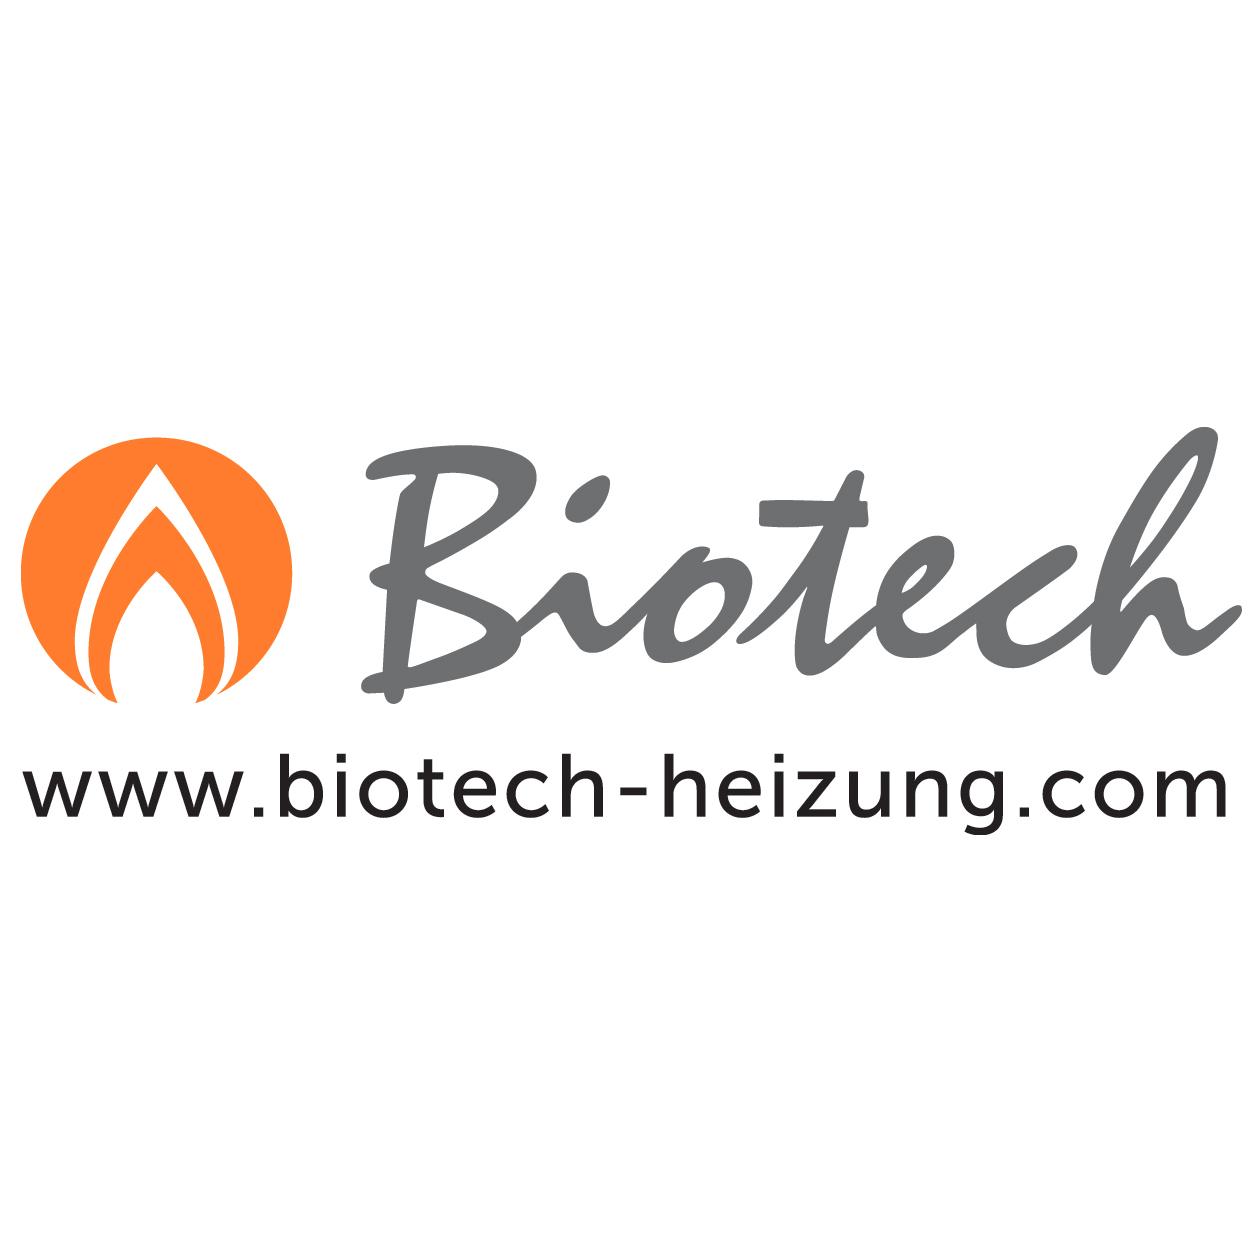 Biotech salon energies construction 2017 for Salon biotech